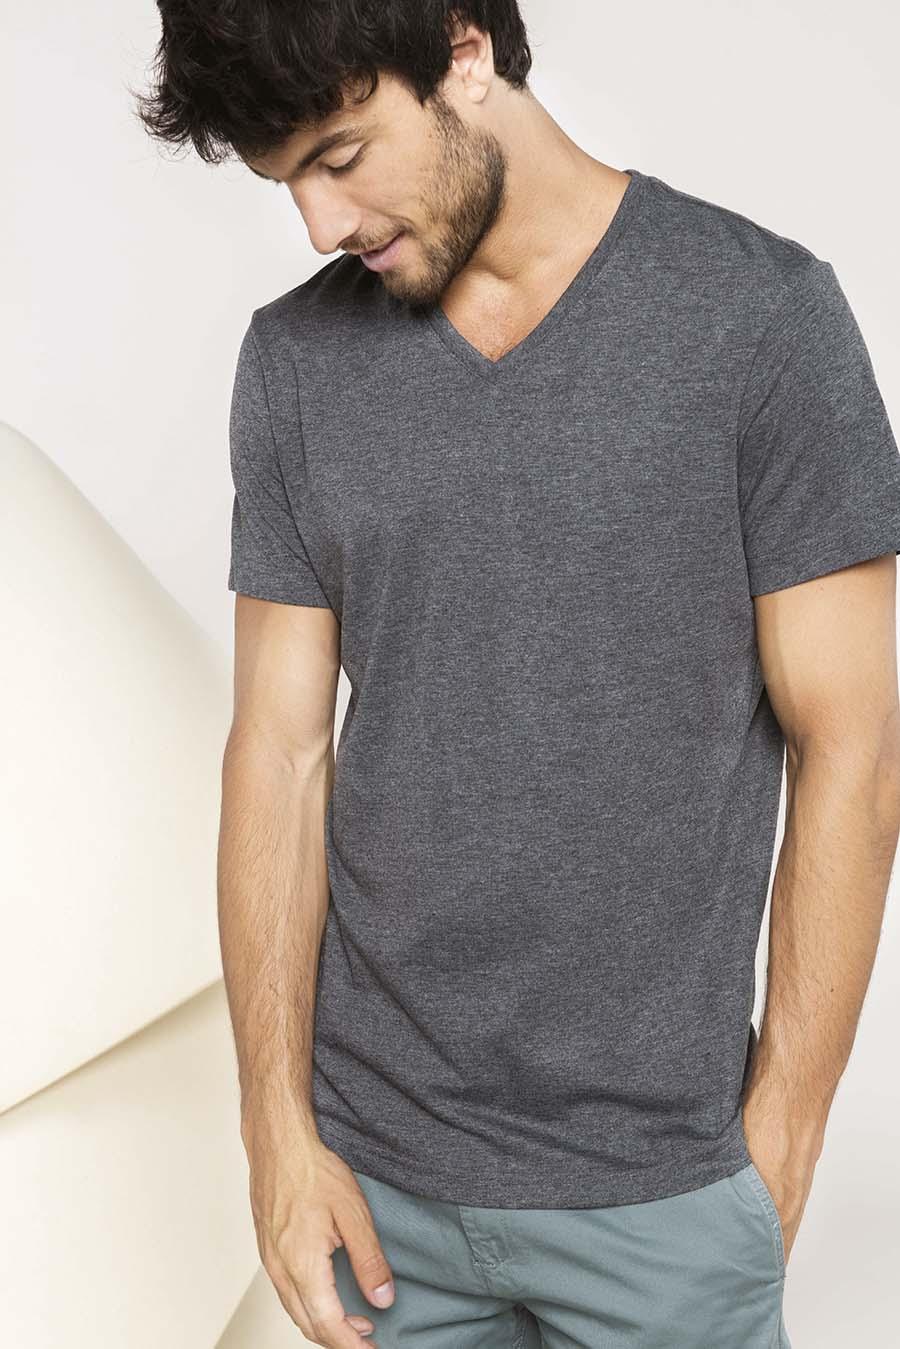 0078dc318b42e Tee-shirts - La communication créative - FULL ACE